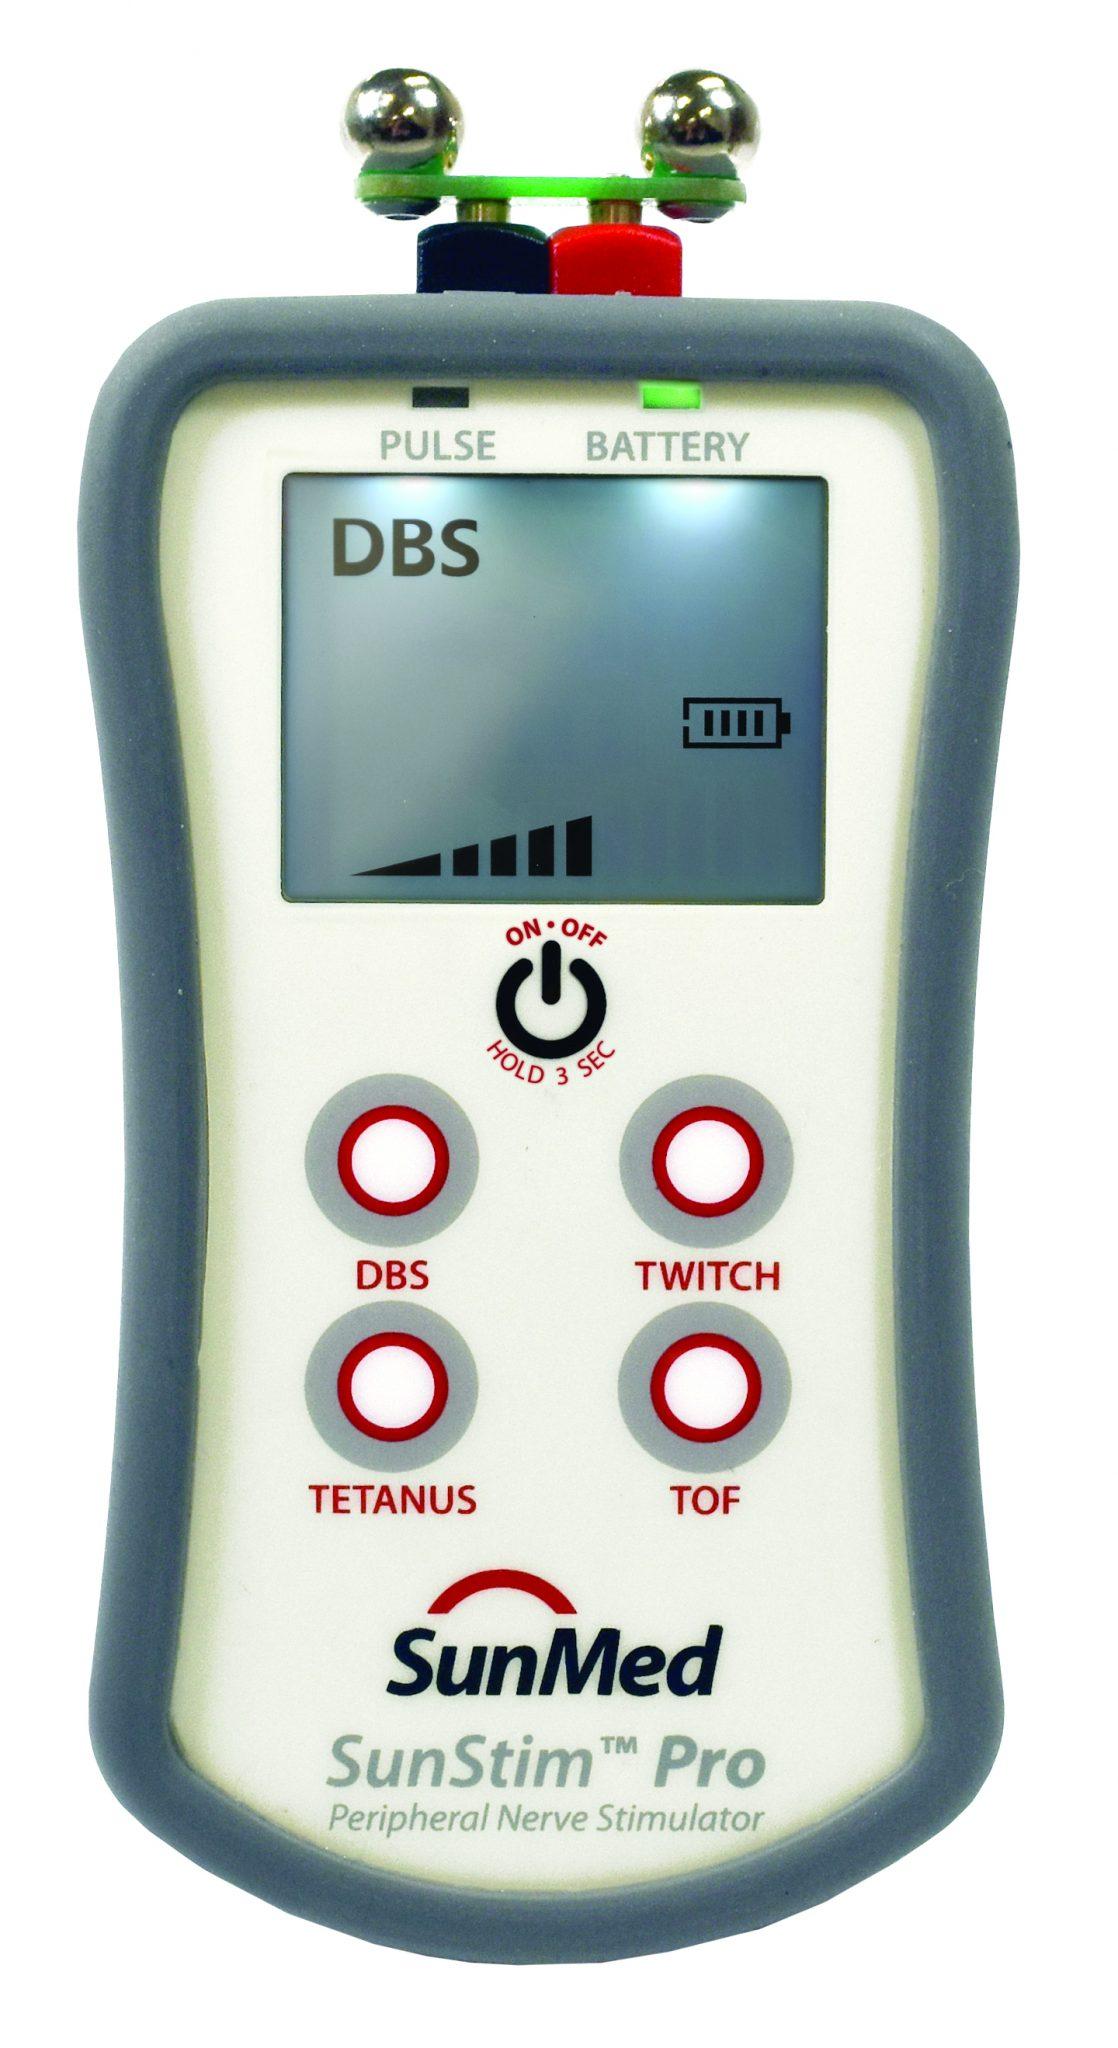 SunStim Pro Peripheral Nerve Stimulator image